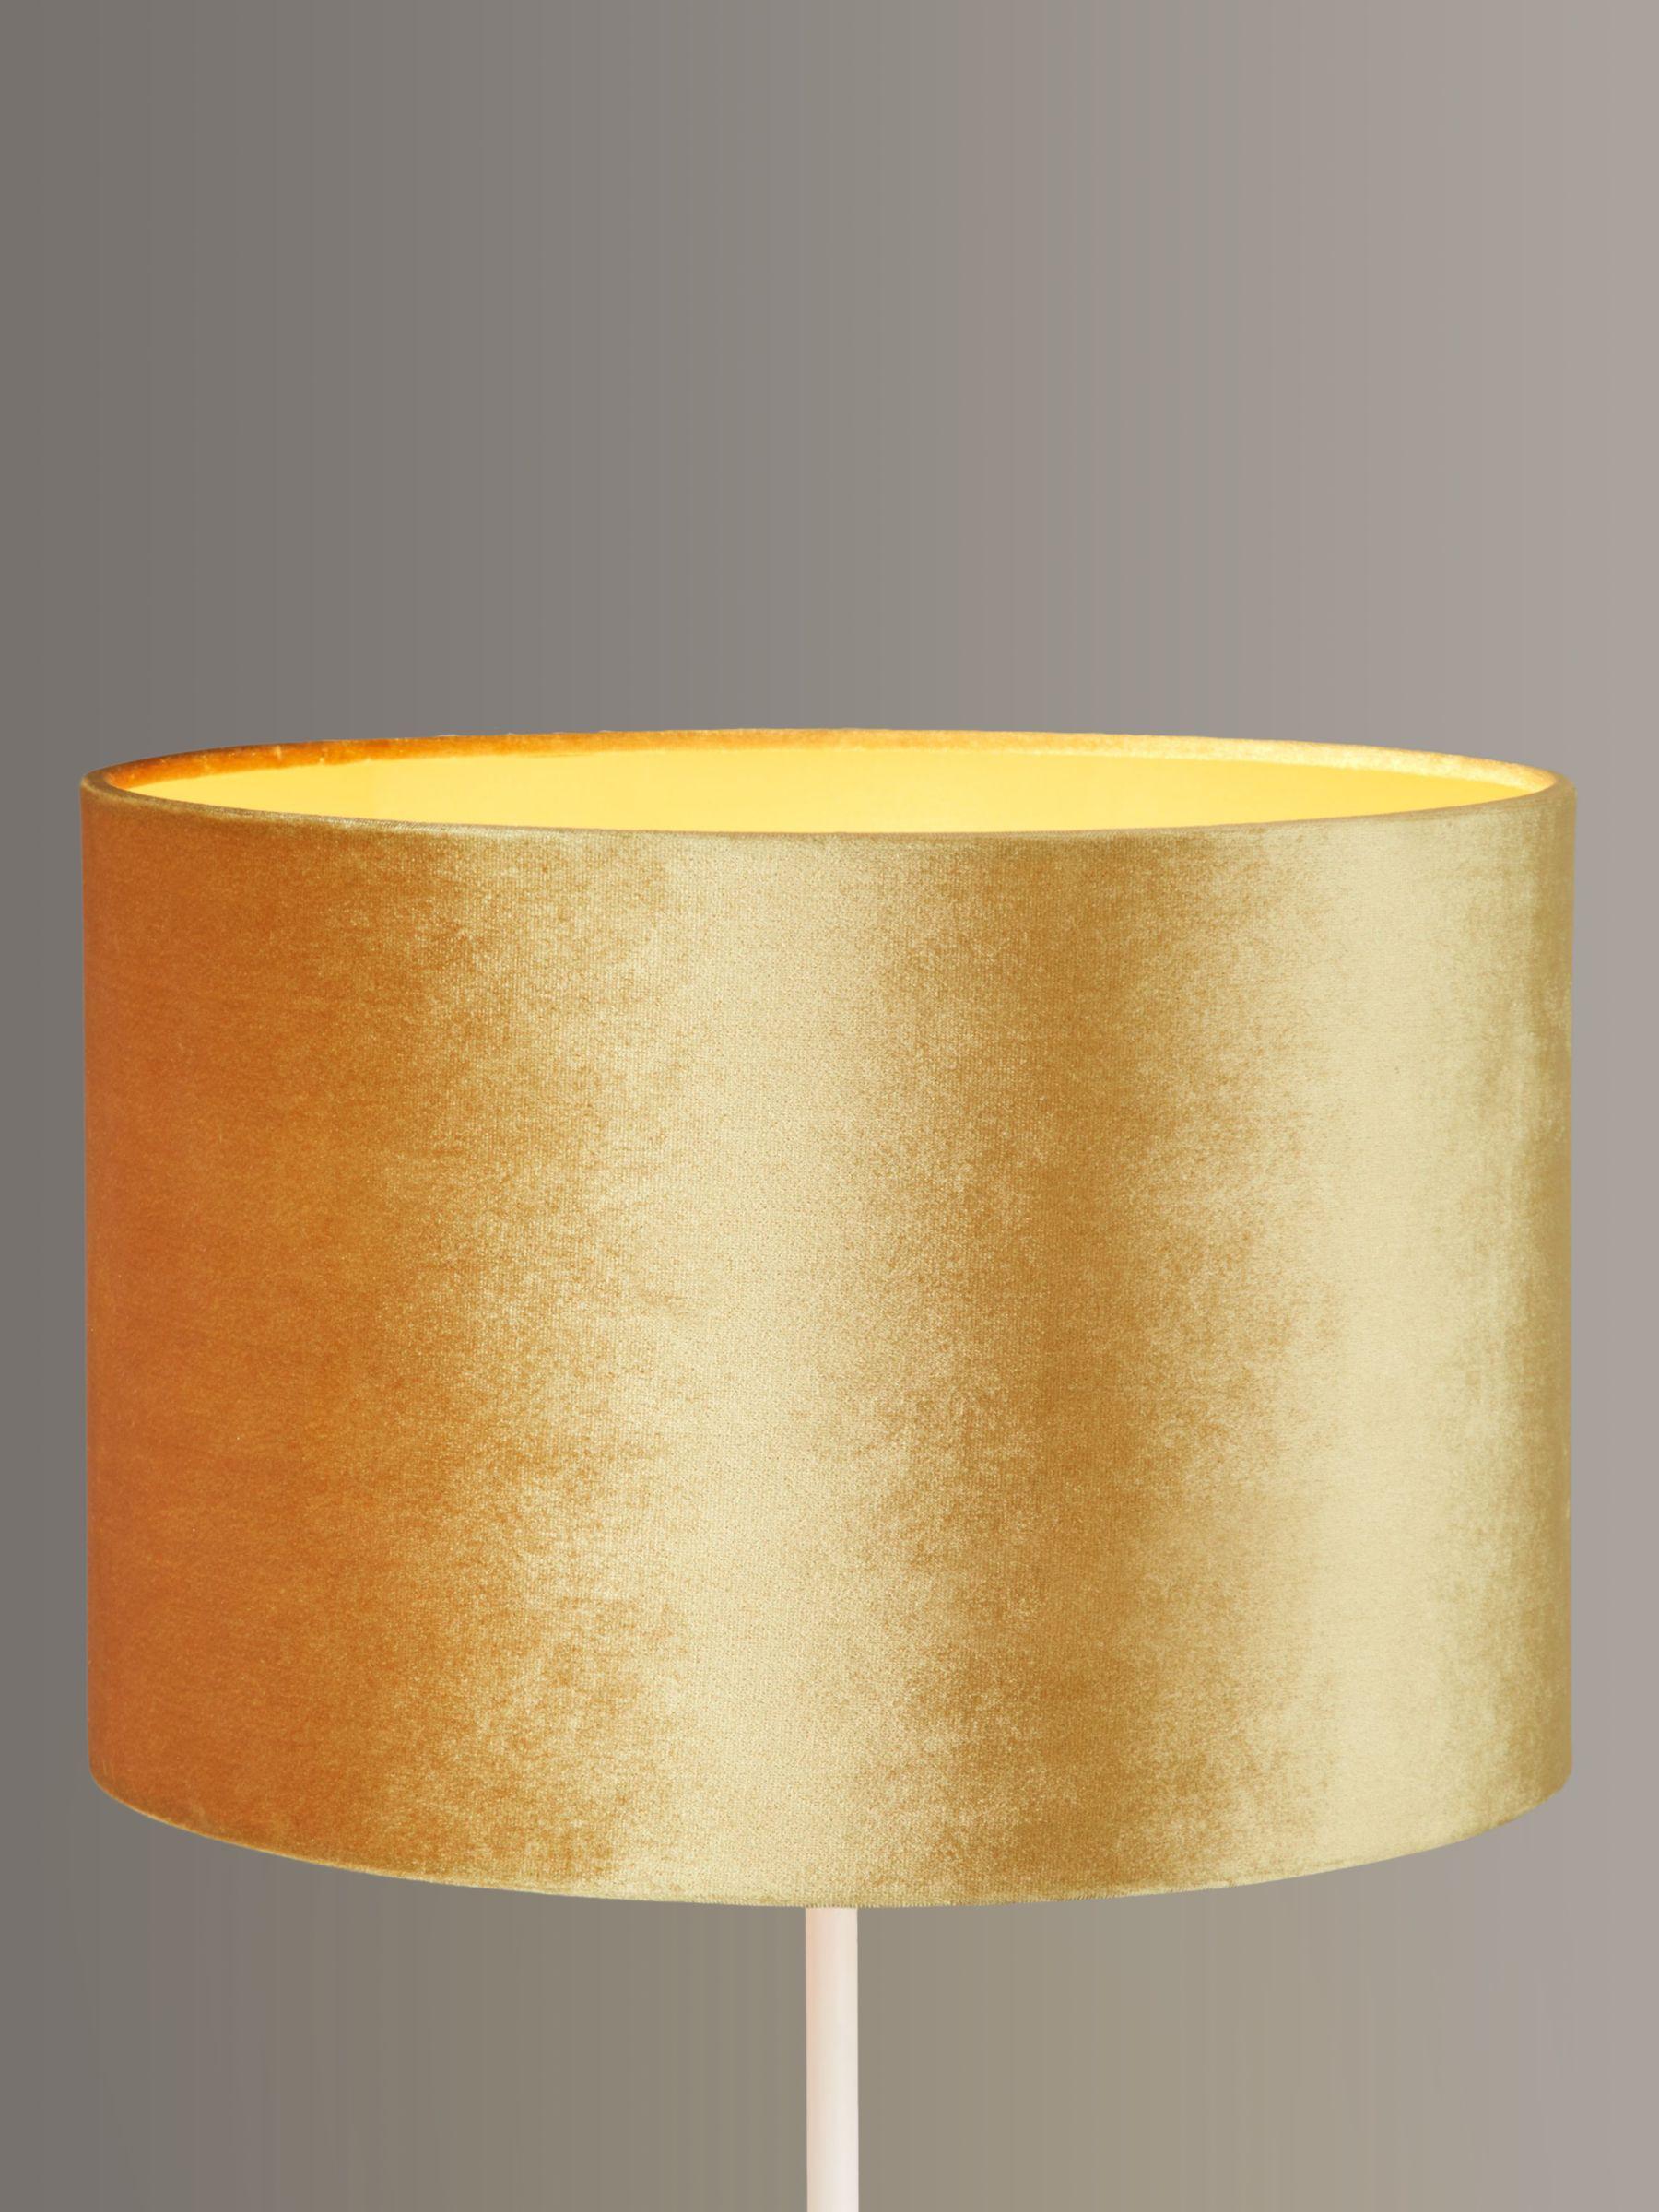 Gold Lampshades John Lewis Partners, Modern Lamp Shades Uk